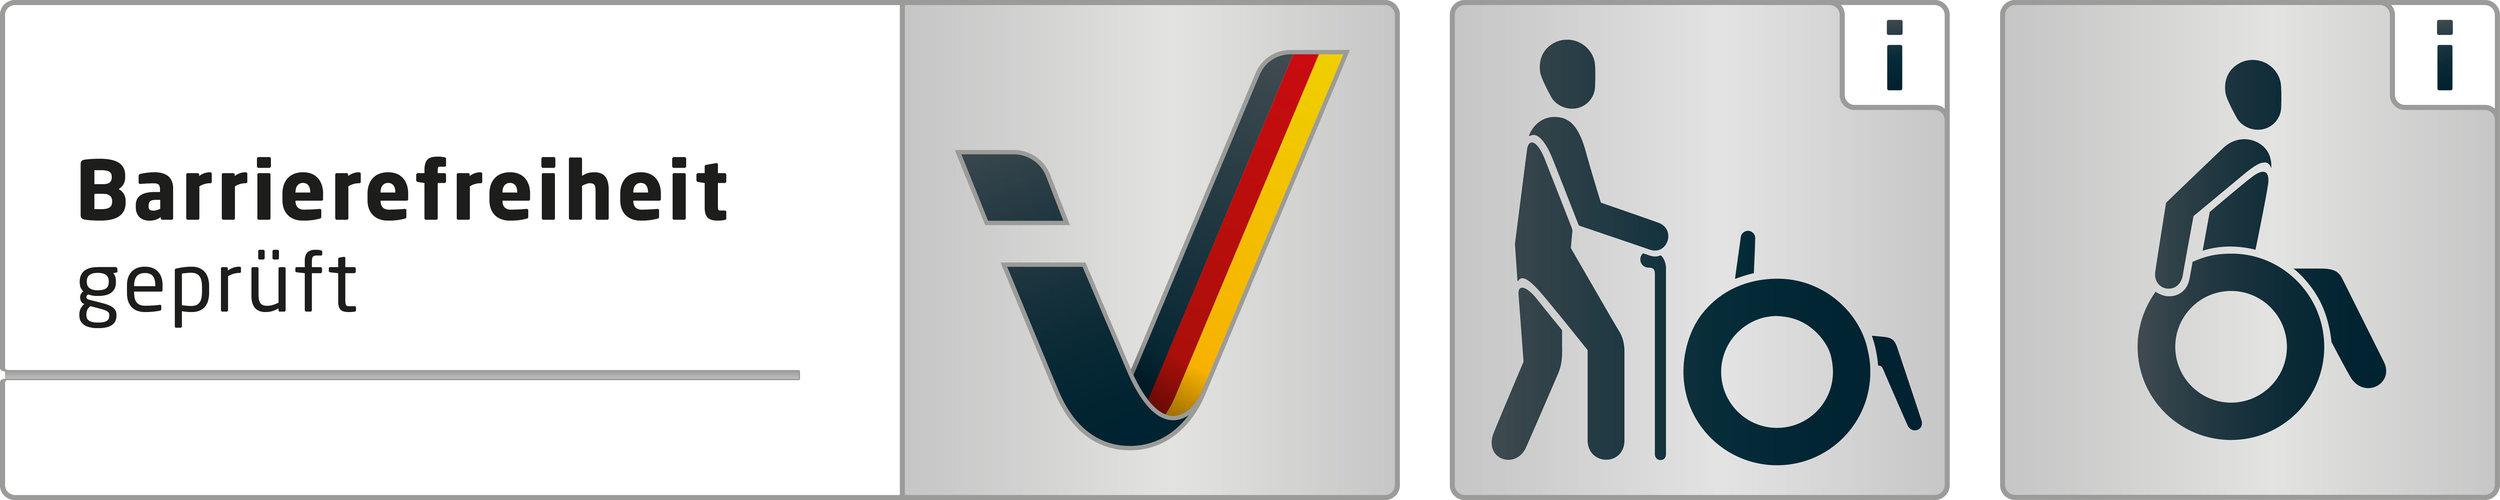 G1 R1_Logo-Pikto.jpg